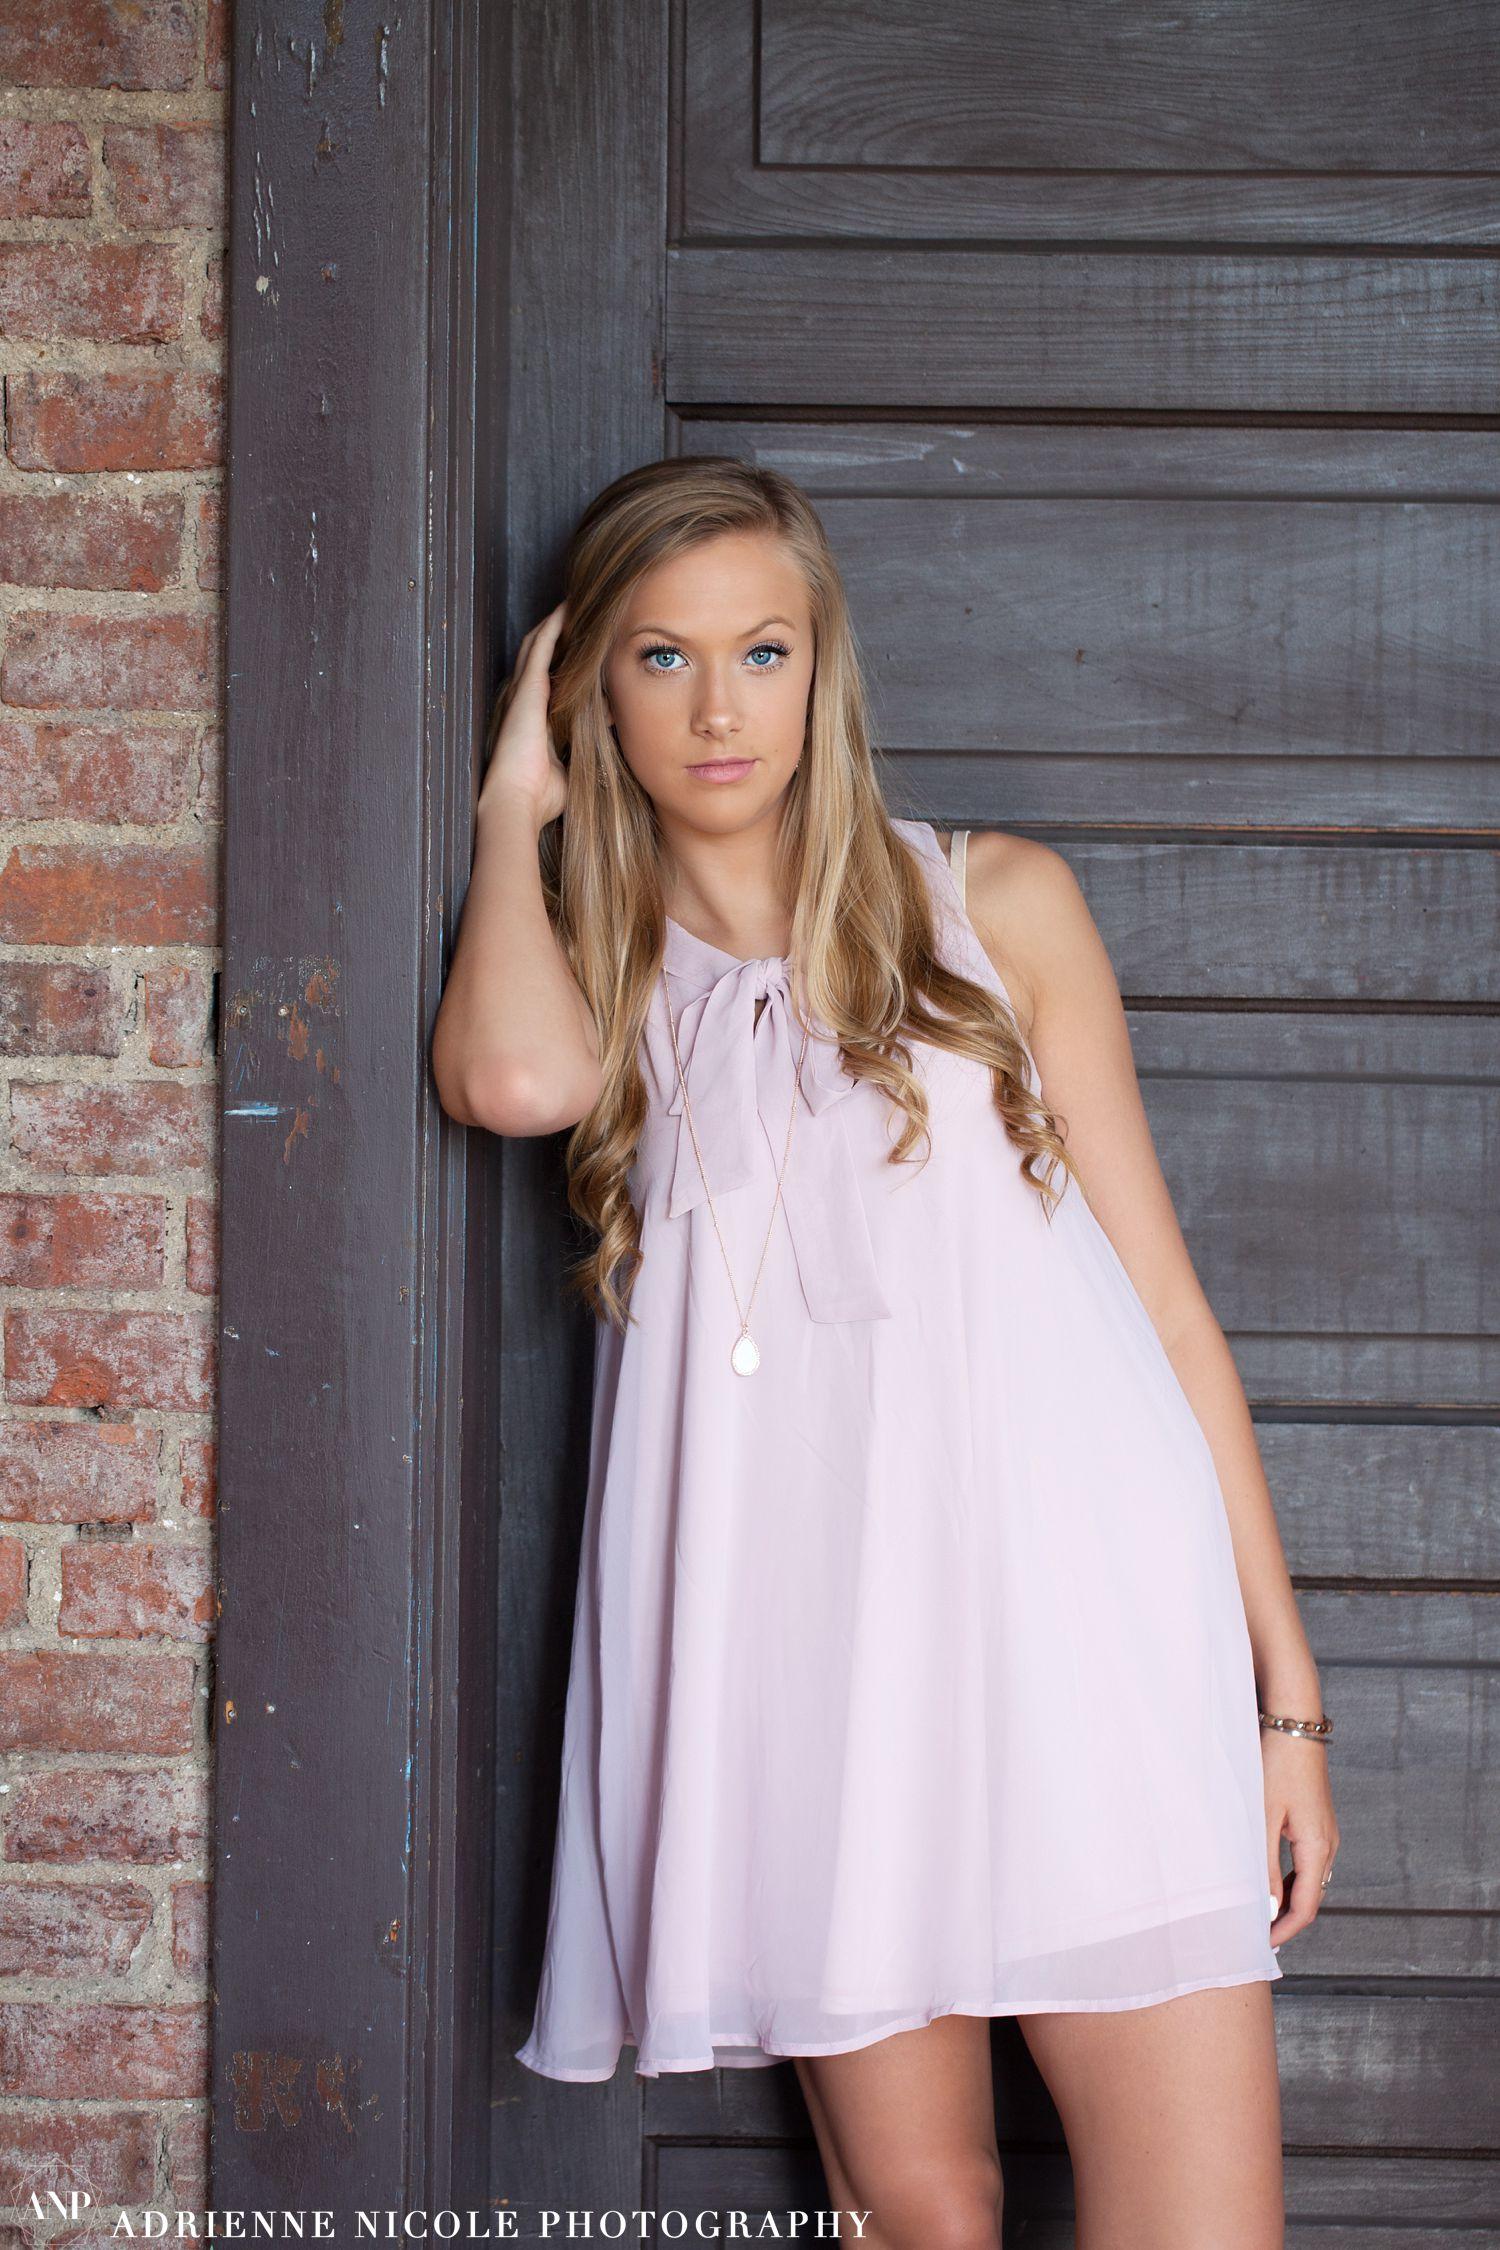 Adrienne Nicole Photography_IndianaSeniorPhotographer_Avon_0283.jpg